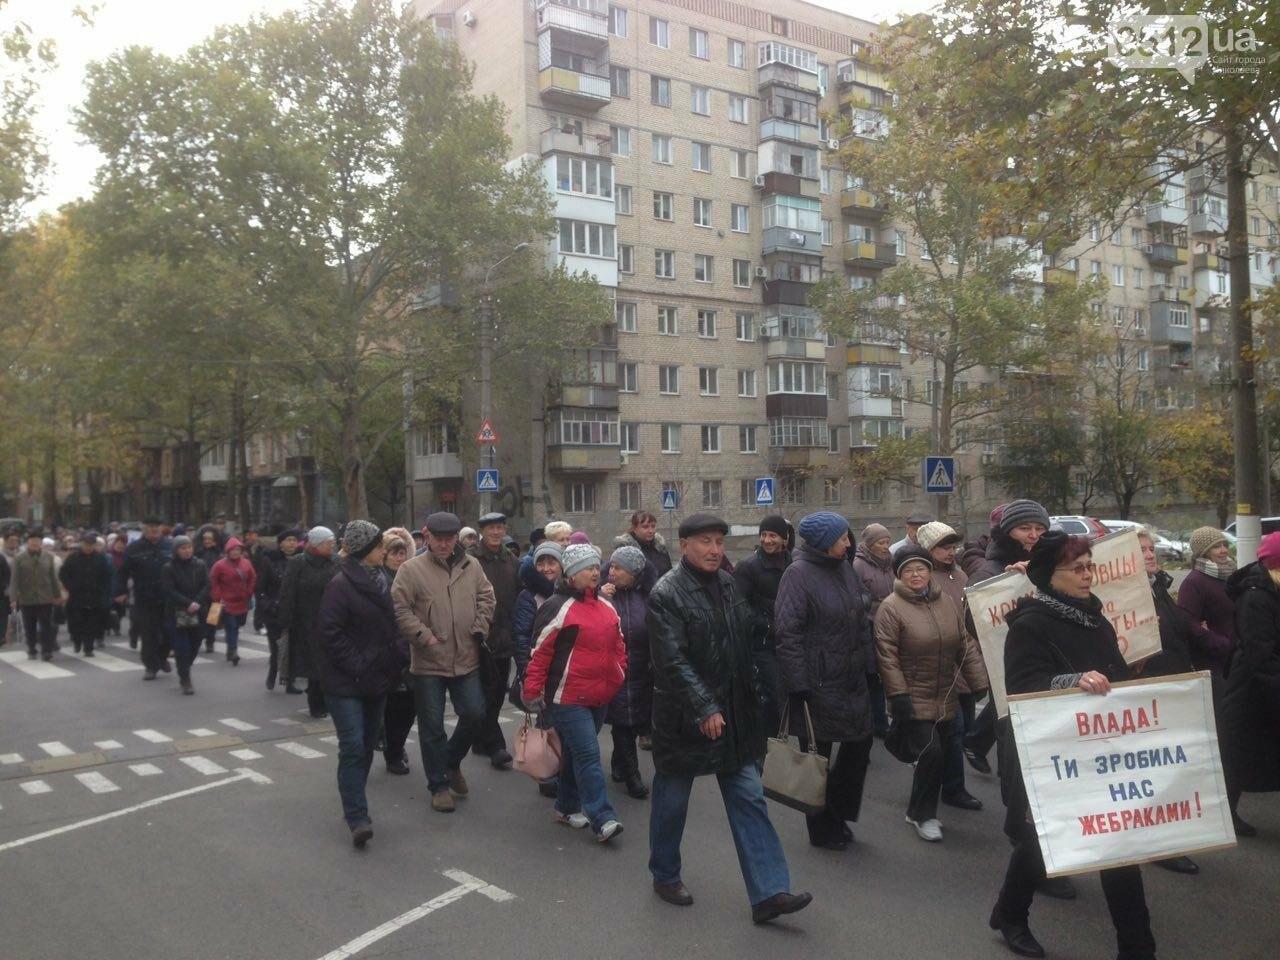 В Николаеве сотрудники завода 61 коммунара устроили митинг перед ОГА - требуют погасить долг по зарплате, - ФОТО, фото-1